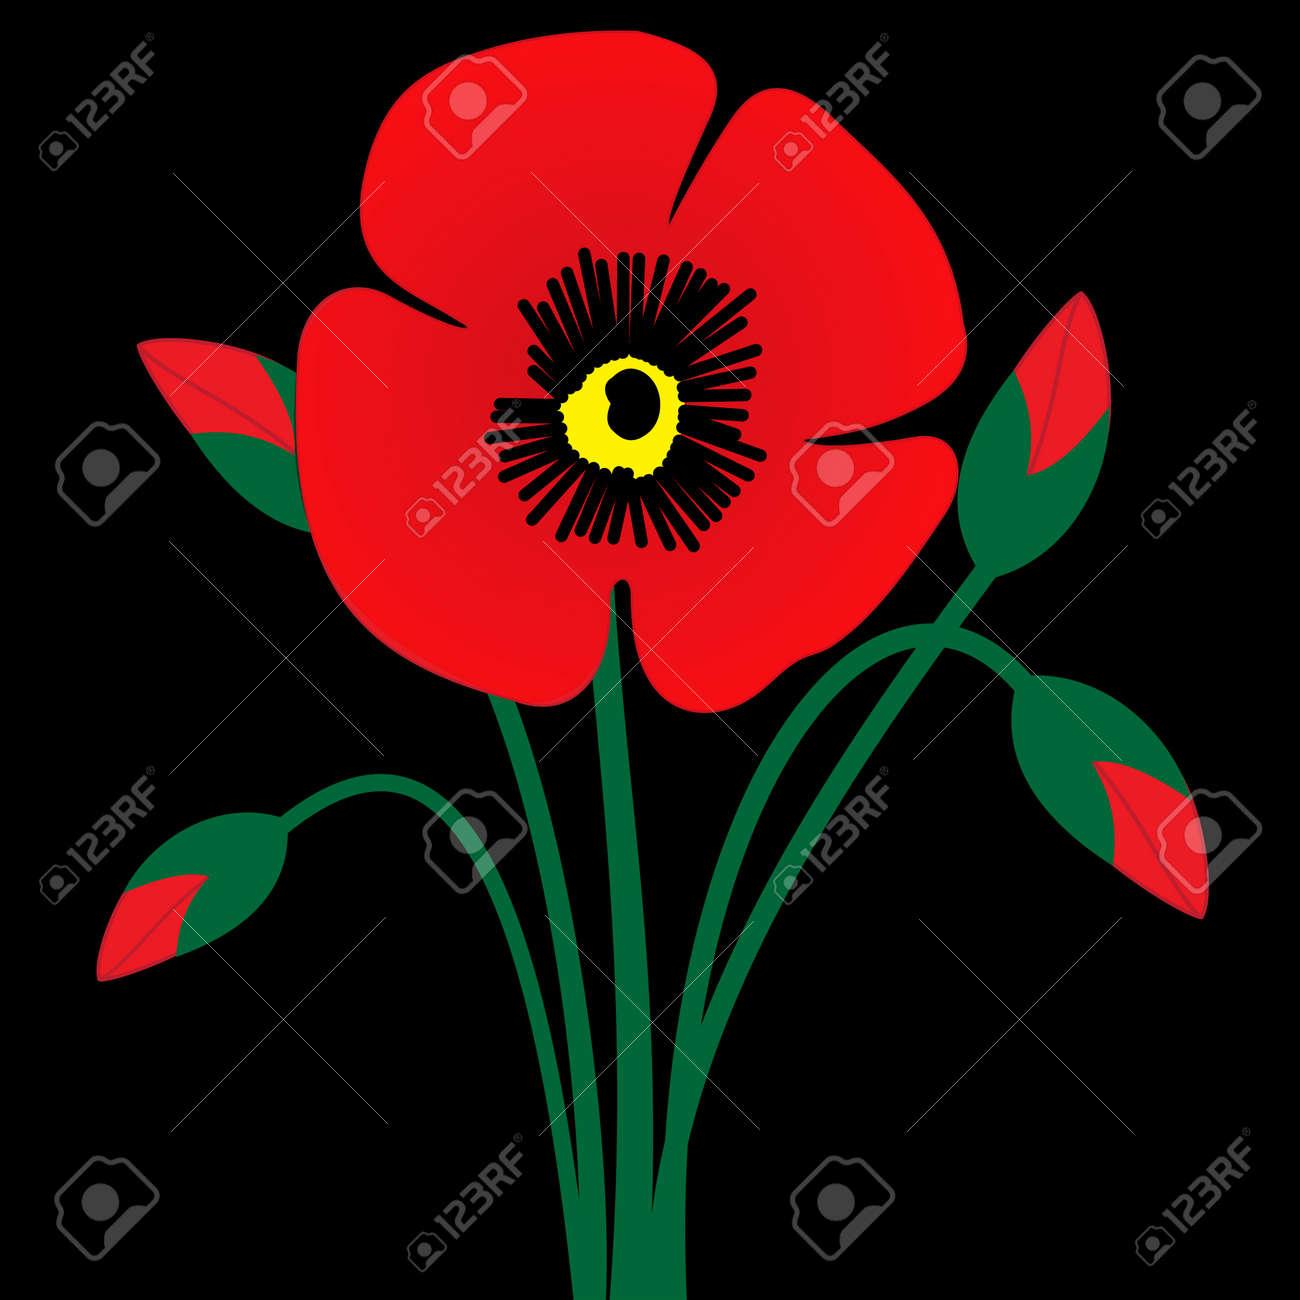 Illustration Of Poppy Flower Bud On A Black Background Royalty Free